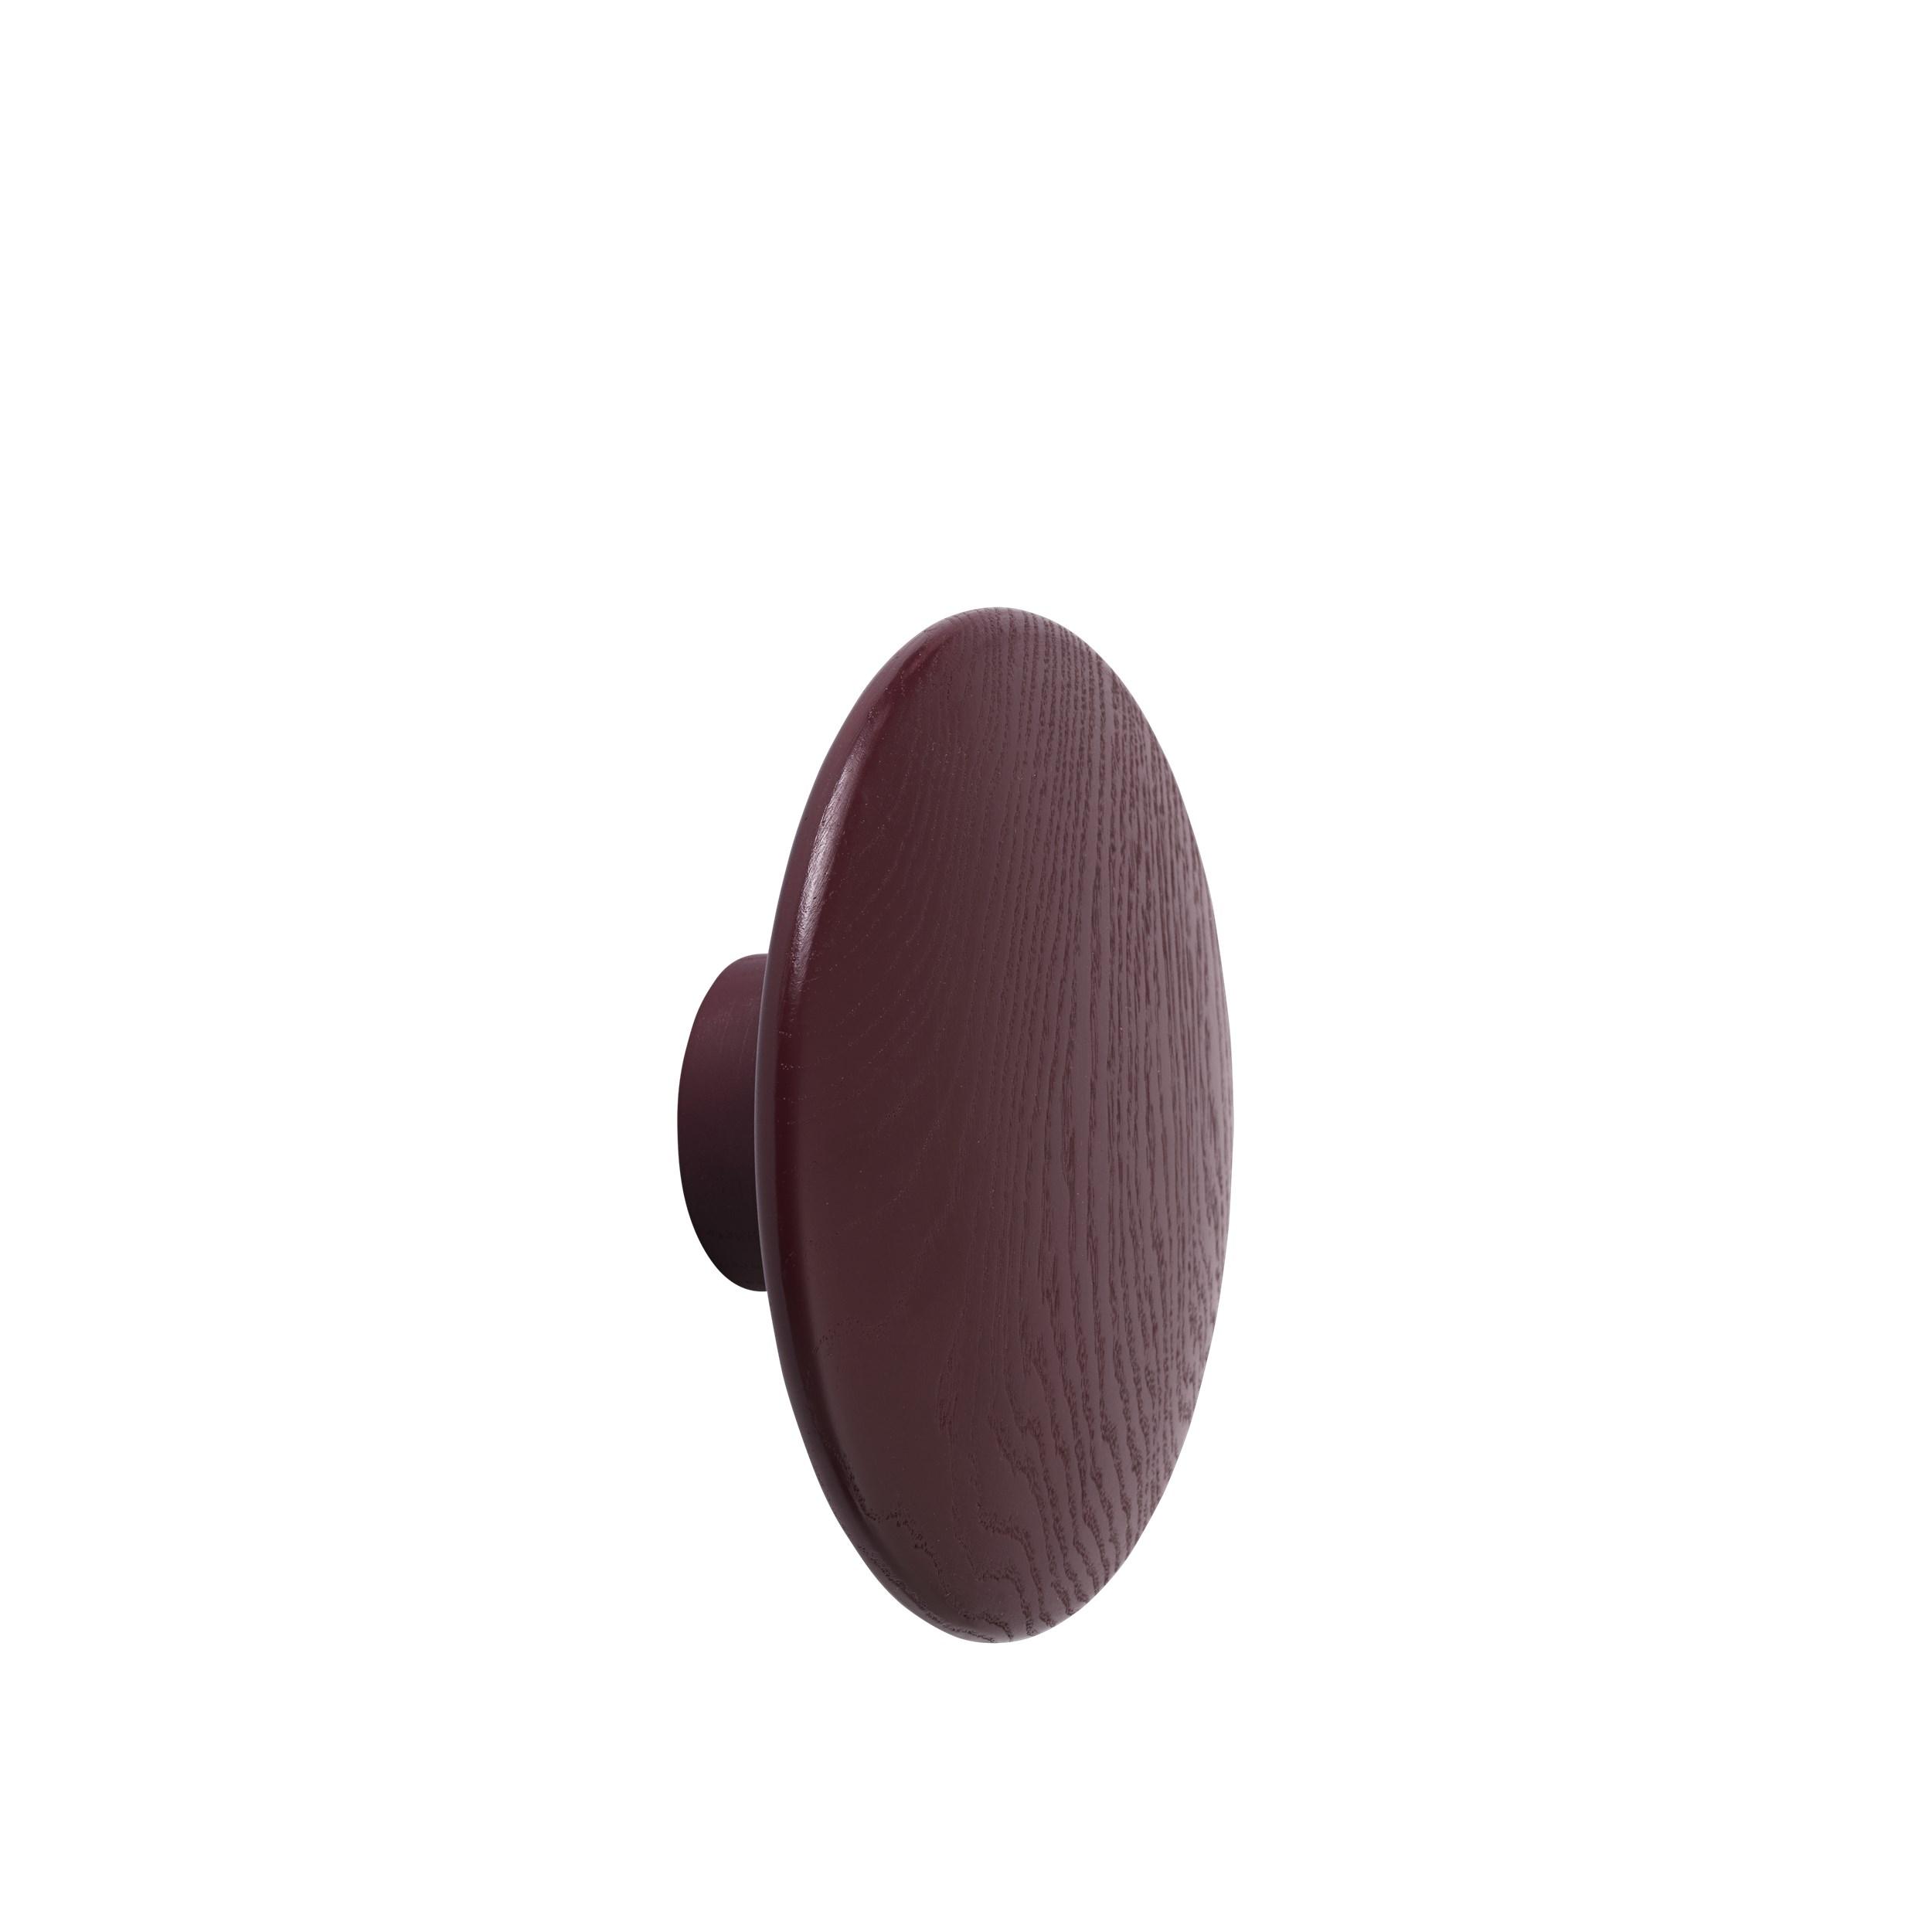 Muuto The Dots knage, large, burgundy